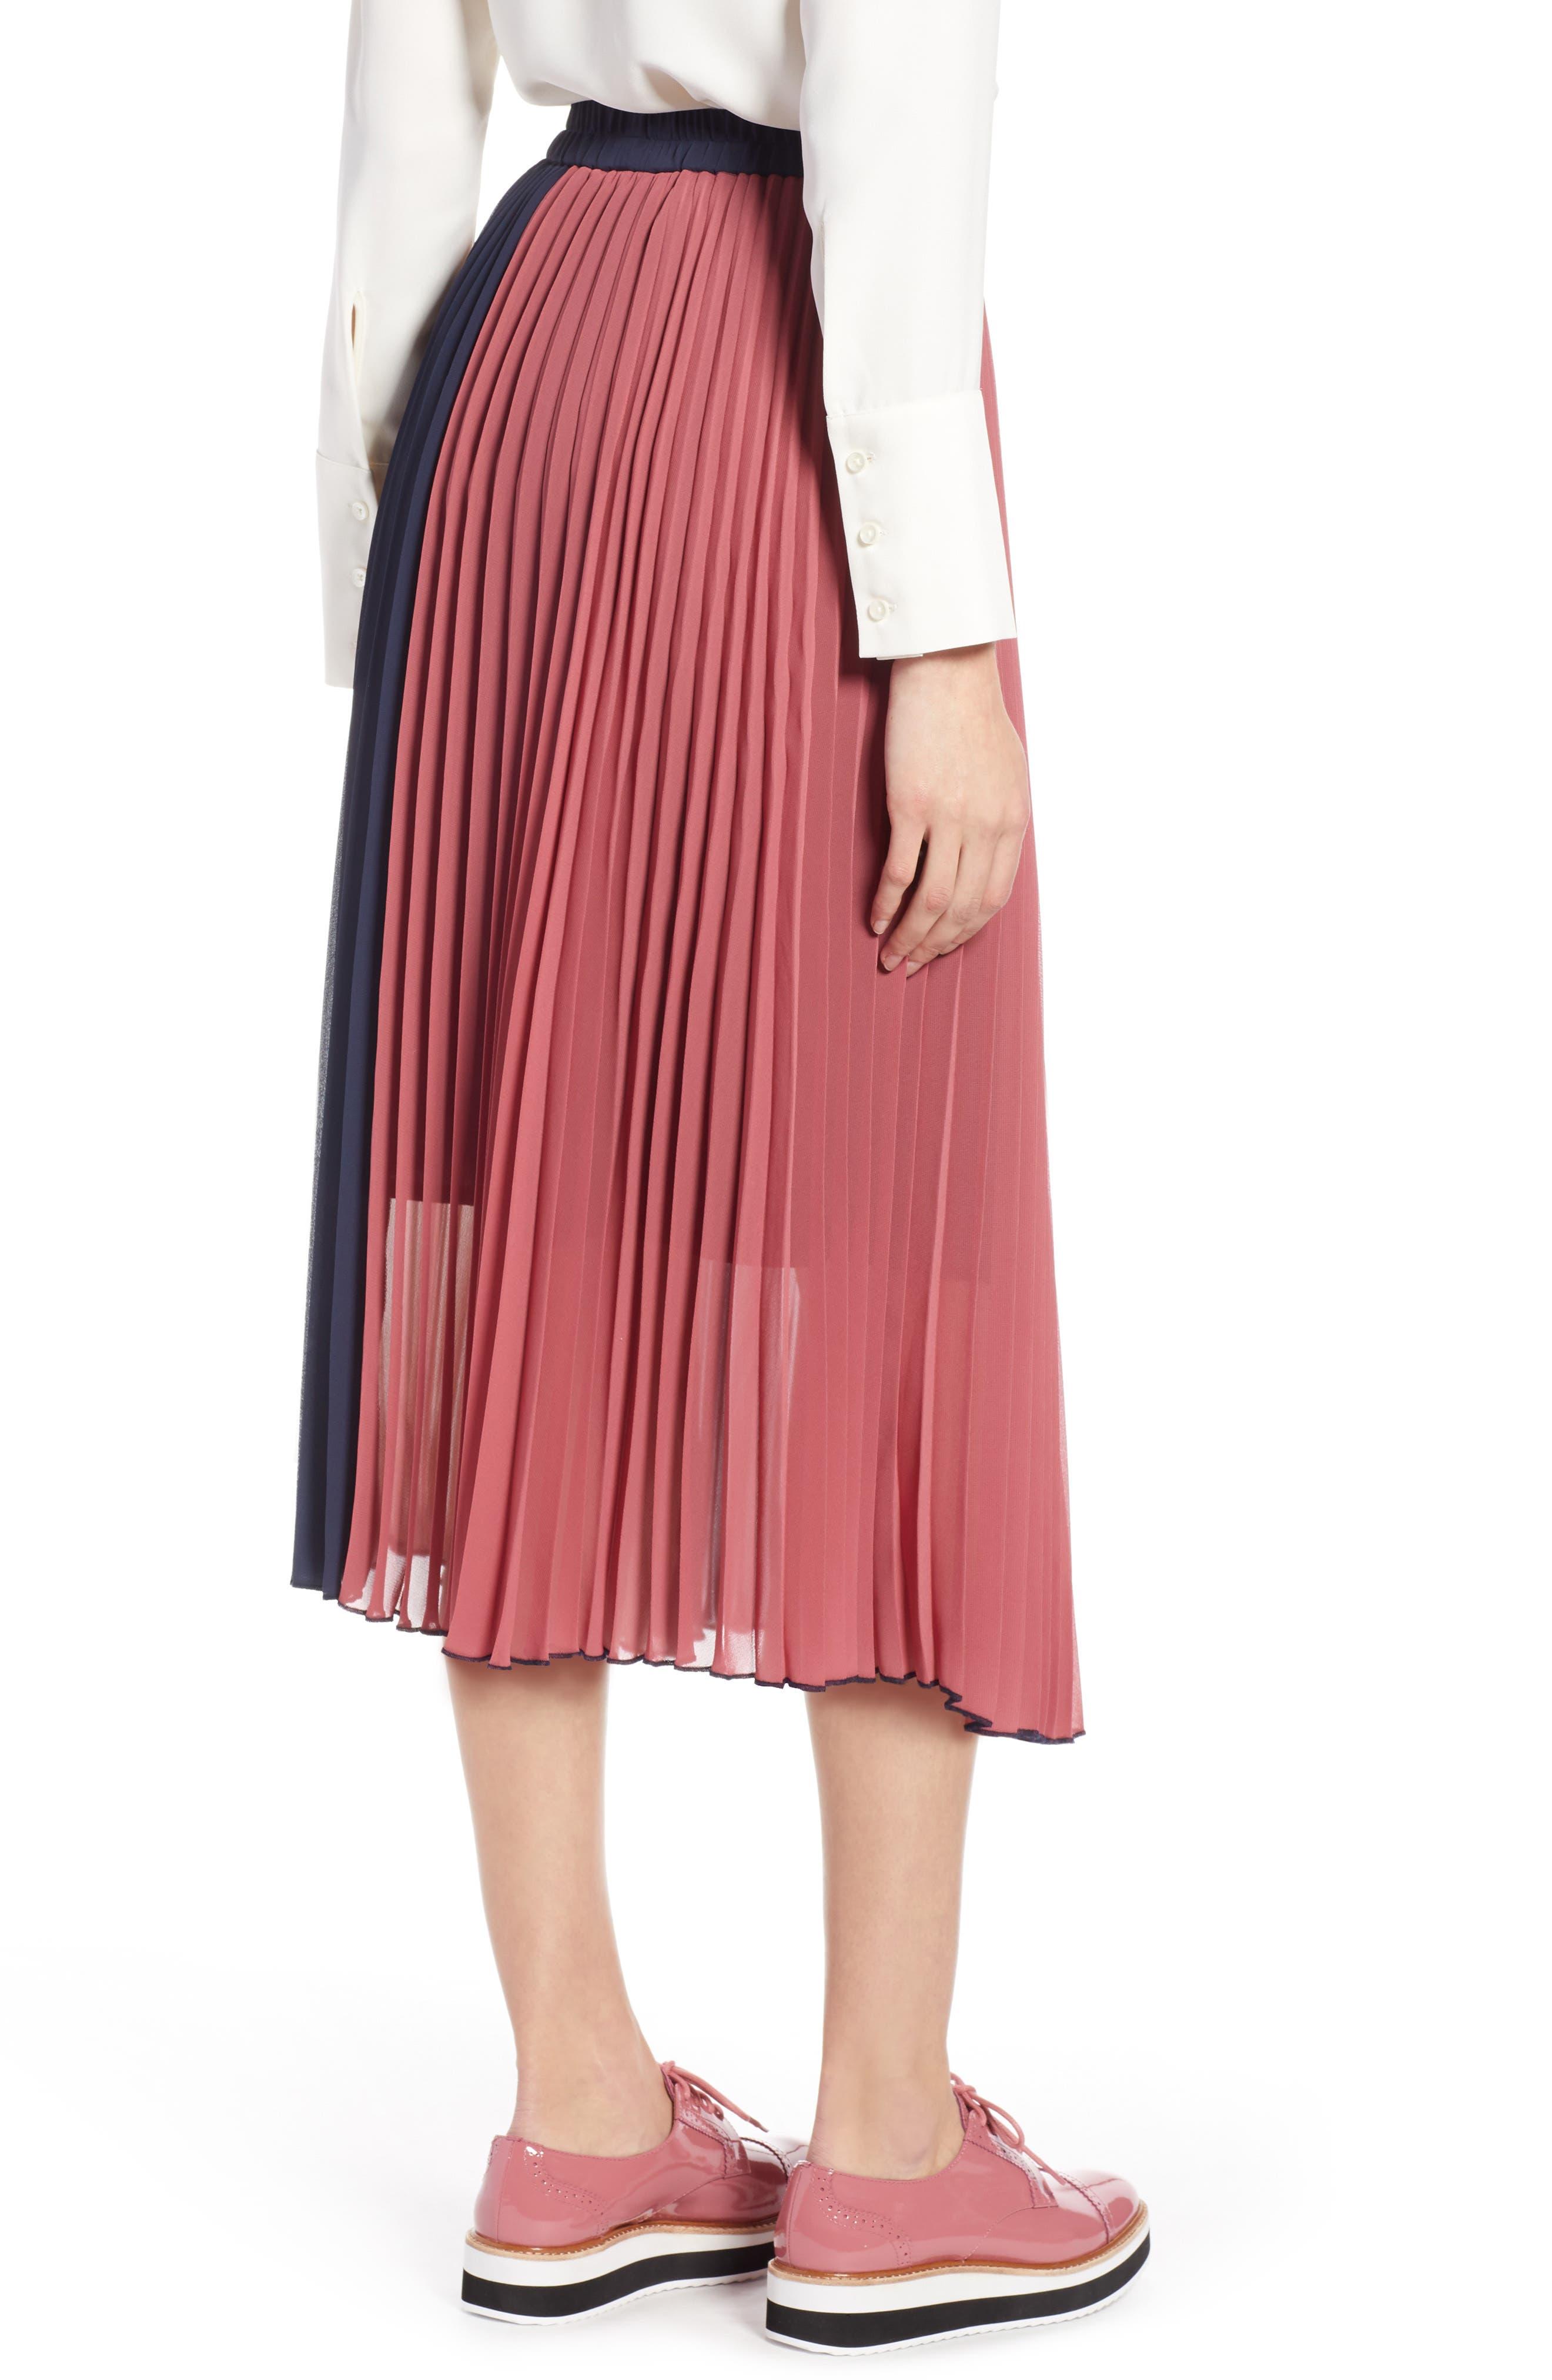 x Atlantic-Pacific Colorblock Pleated Midi Skirt,                             Alternate thumbnail 3, color,                             PINK- NAVY COLORBLOCK